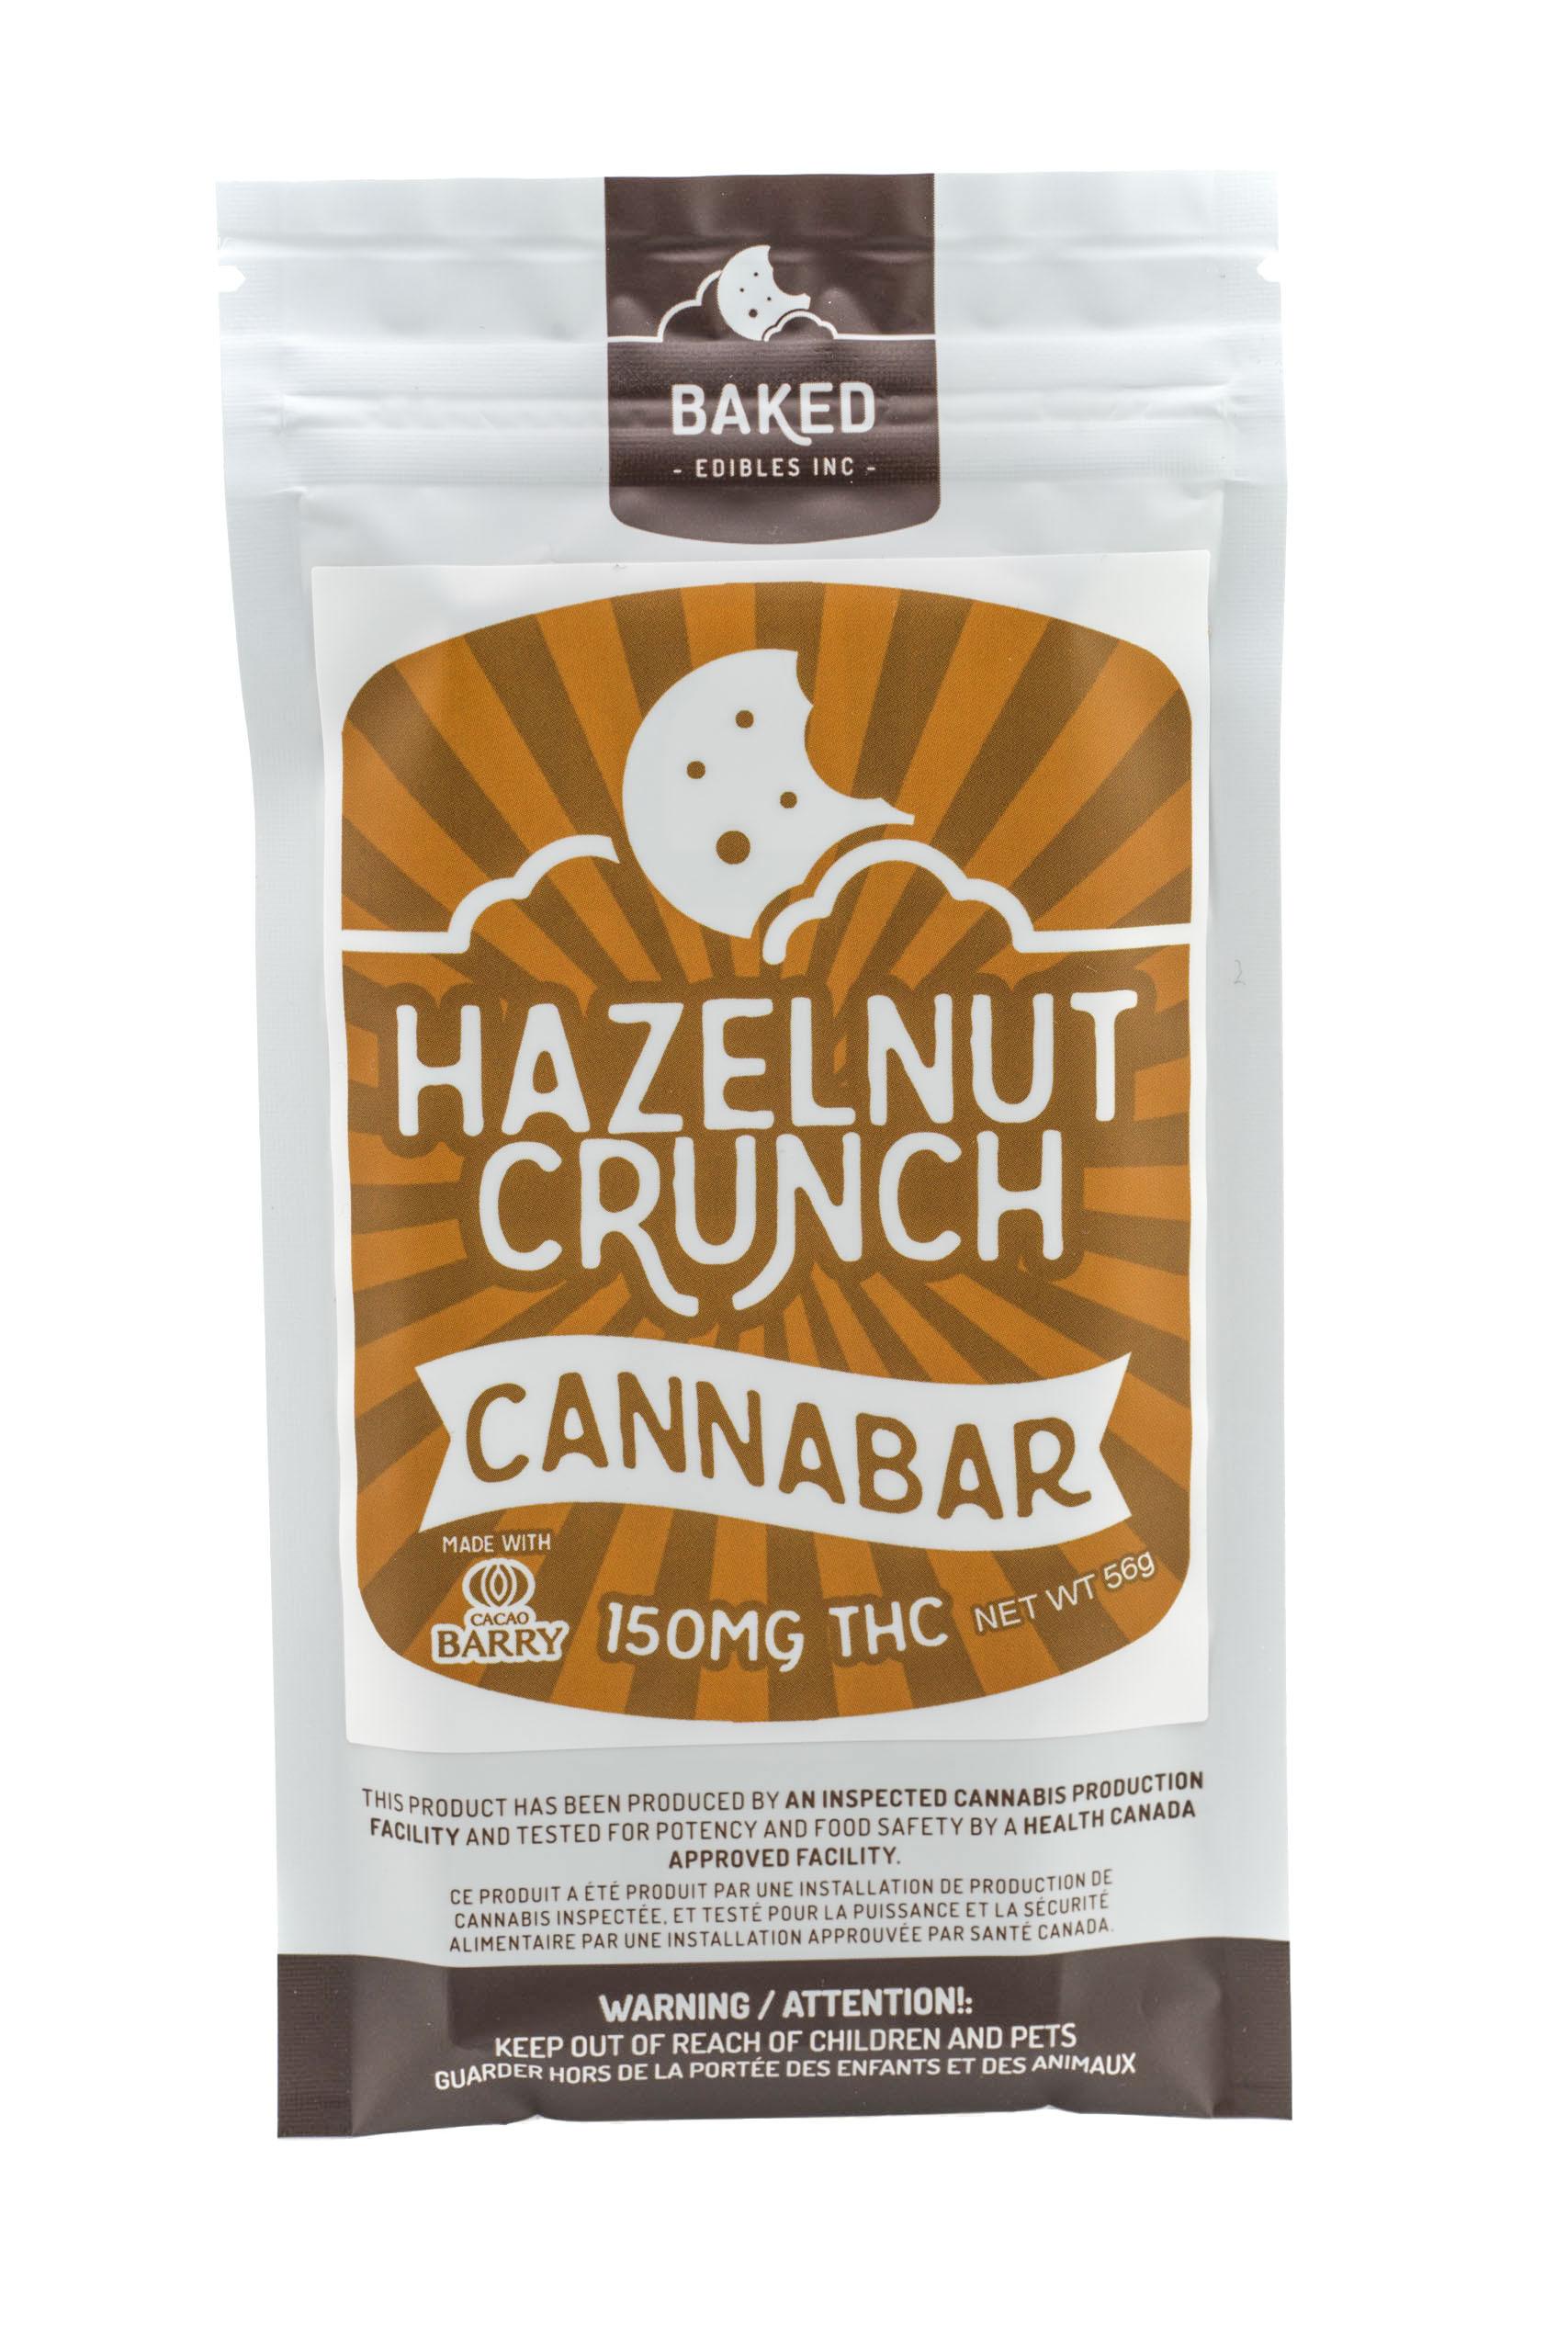 Hazelnut Crunch Cannabar (150mg THC)  by Baked Edibles 00011